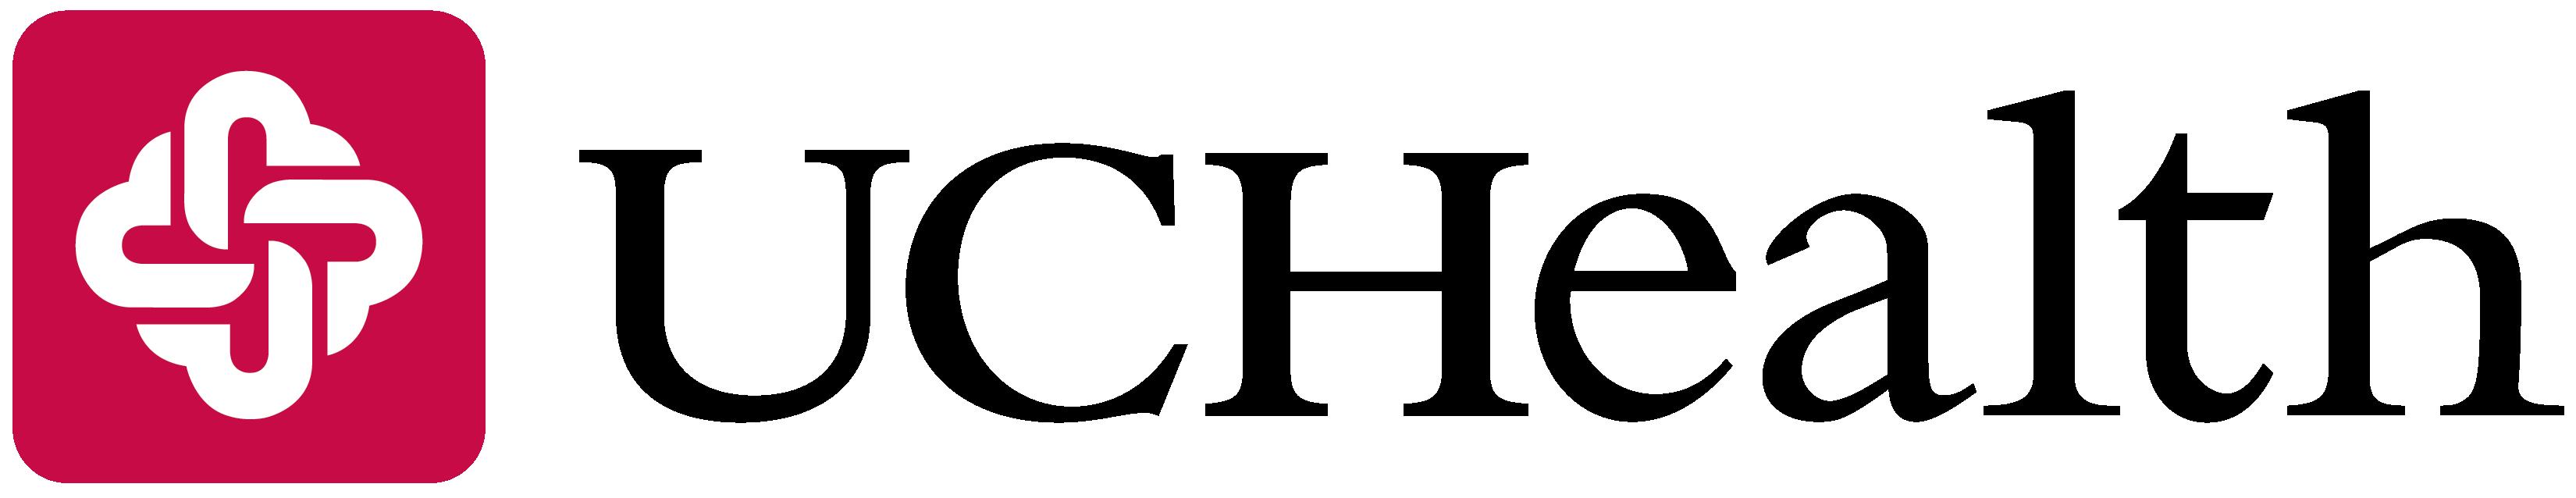 Uchealth Logos